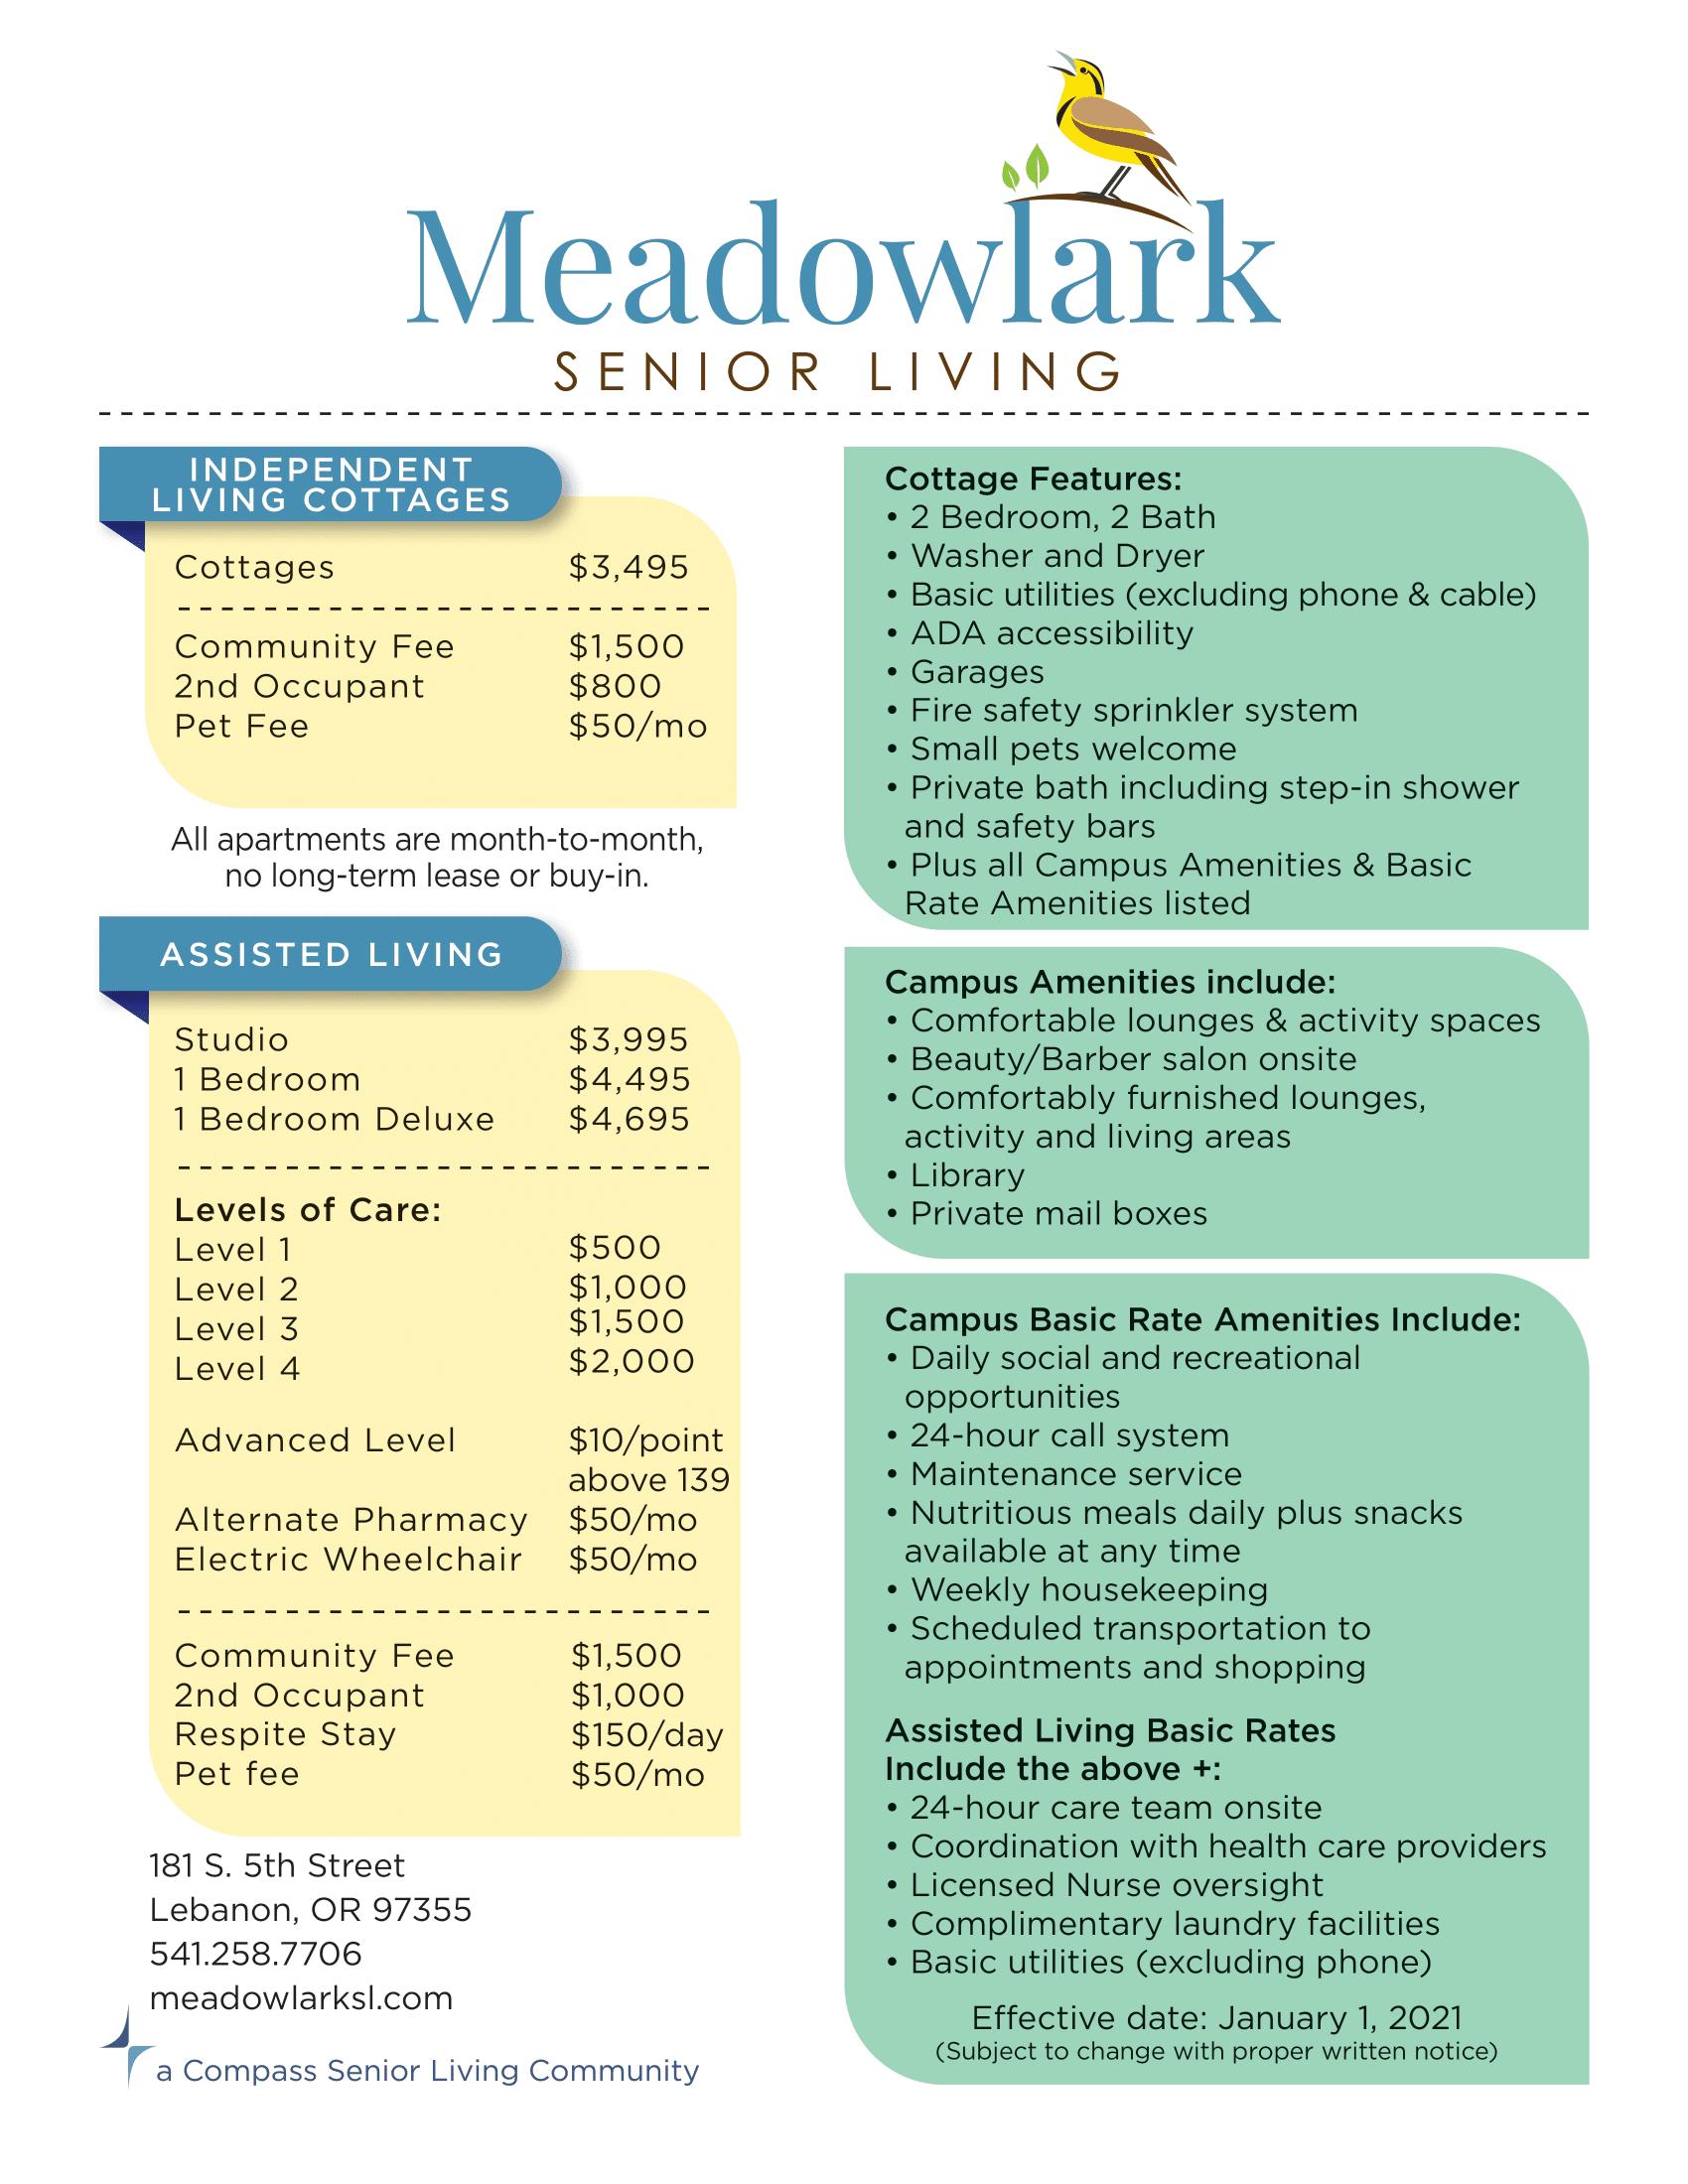 Meadowlark Senior Living rate sheet